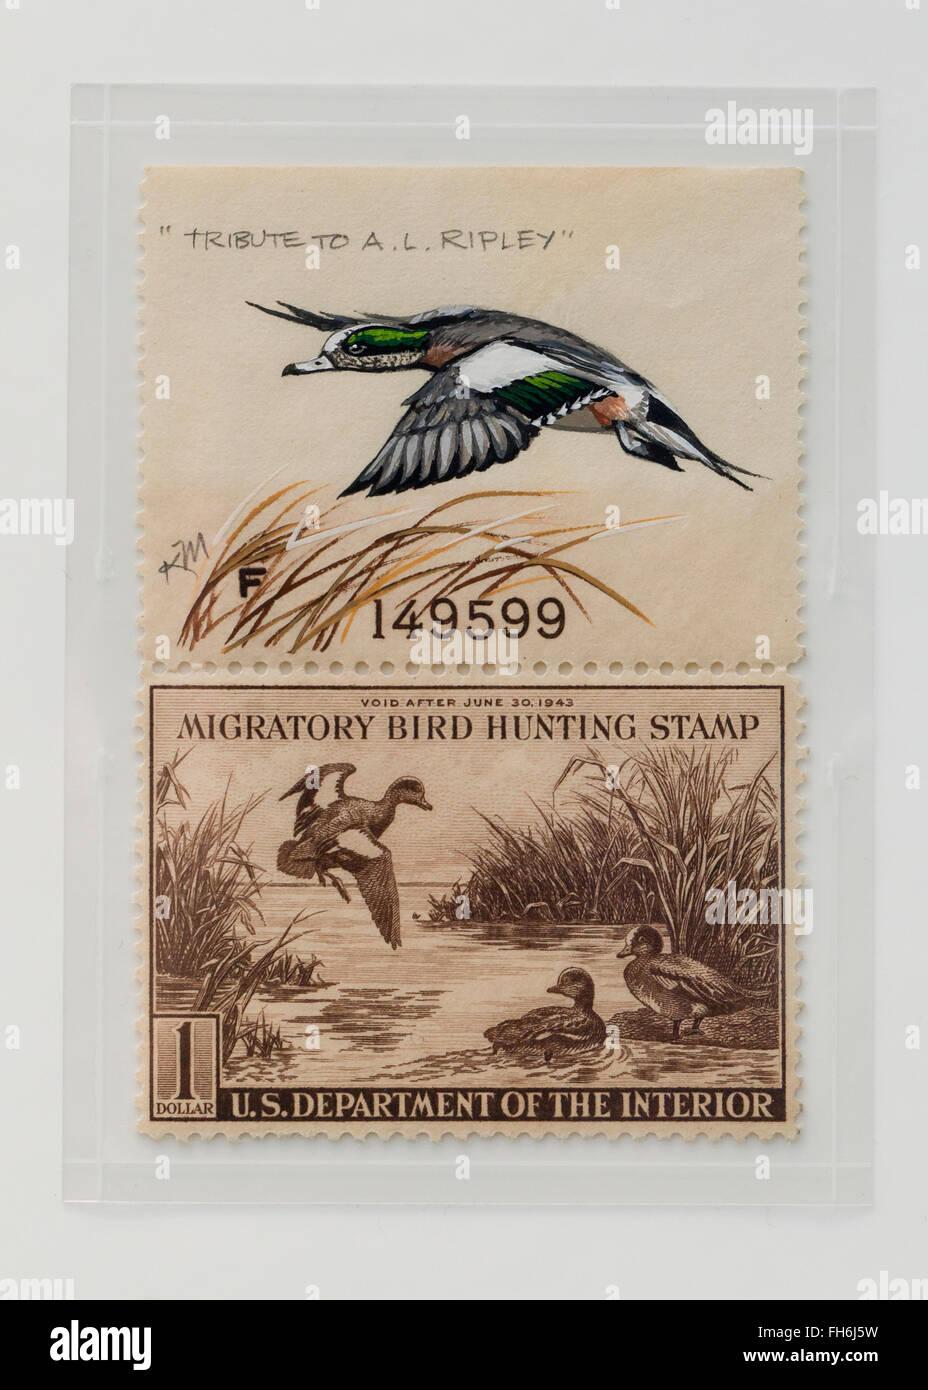 Vintage Migratory Bird Hunting Stamp $1 Baldtapes stamp, circa 1942 - USA - Stock Image